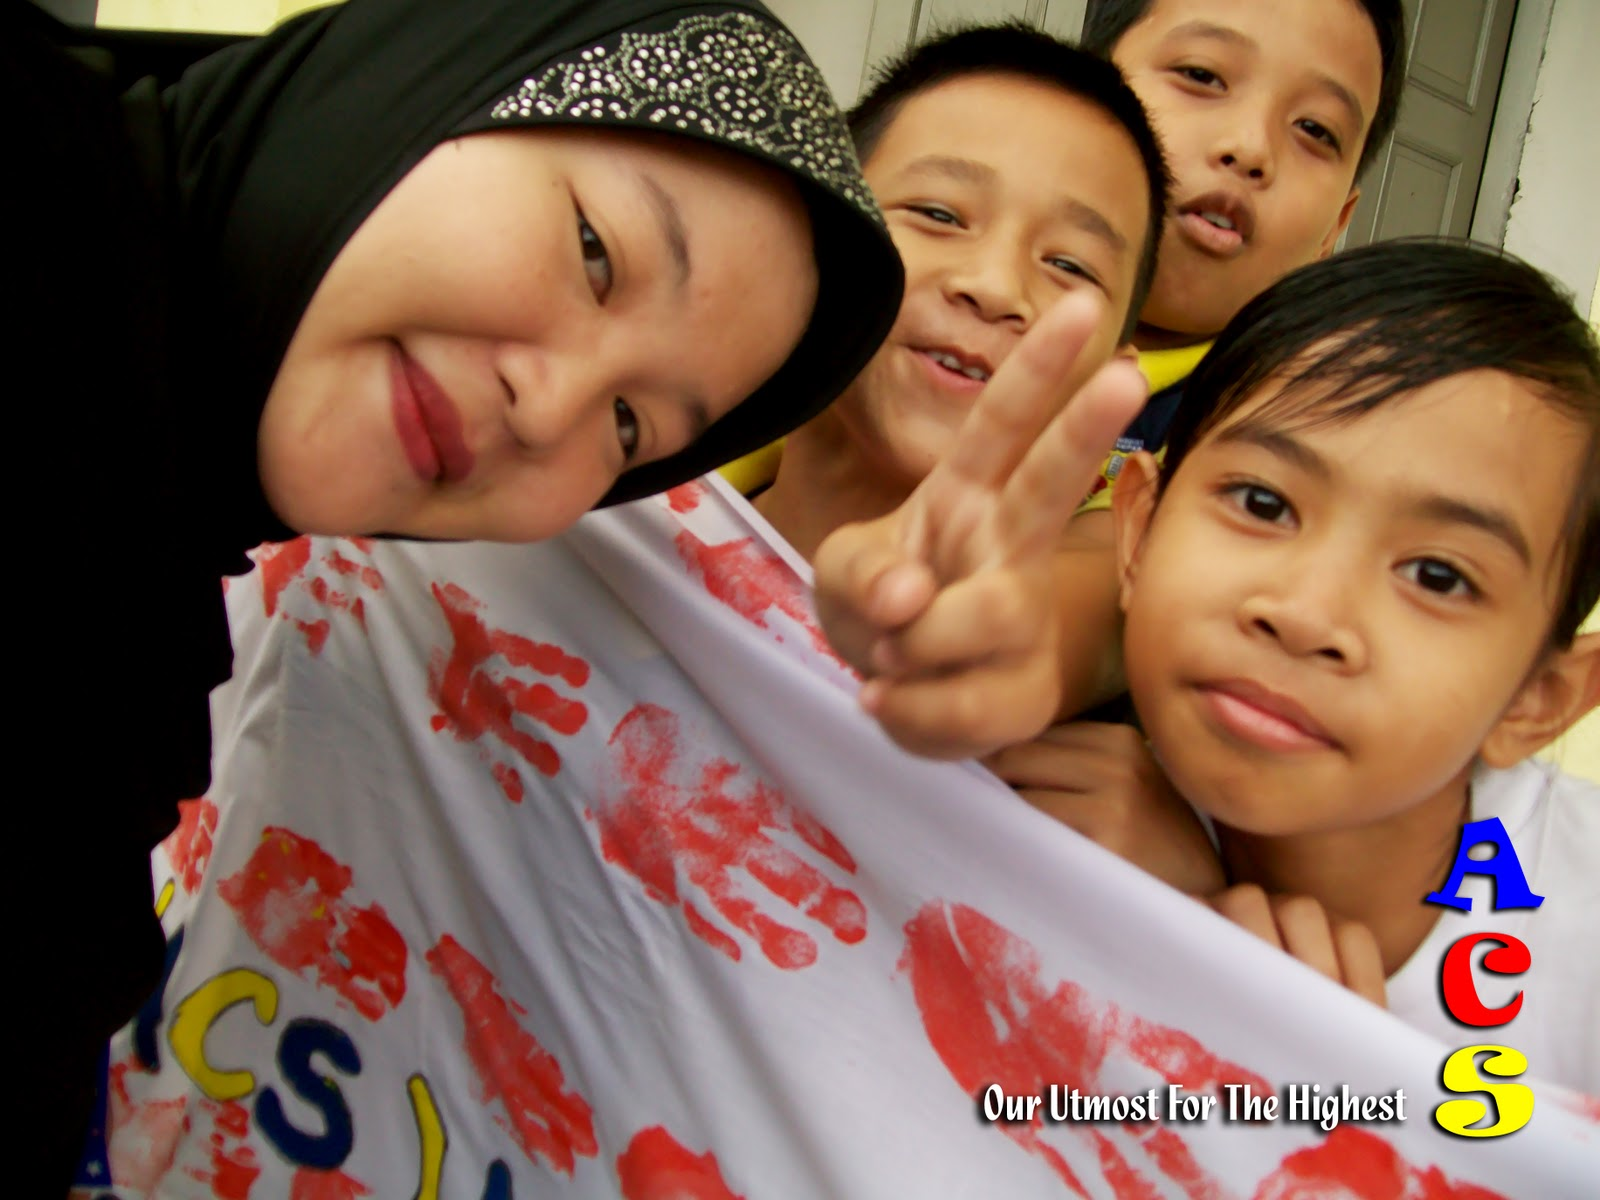 esei satu malaysia menjana transformasi Satu malaysia - gagasan bagi memupuk perpaduan dalam kalangan  iaitu satu  malaysia menjana transformasi - menekankan transformasi/.